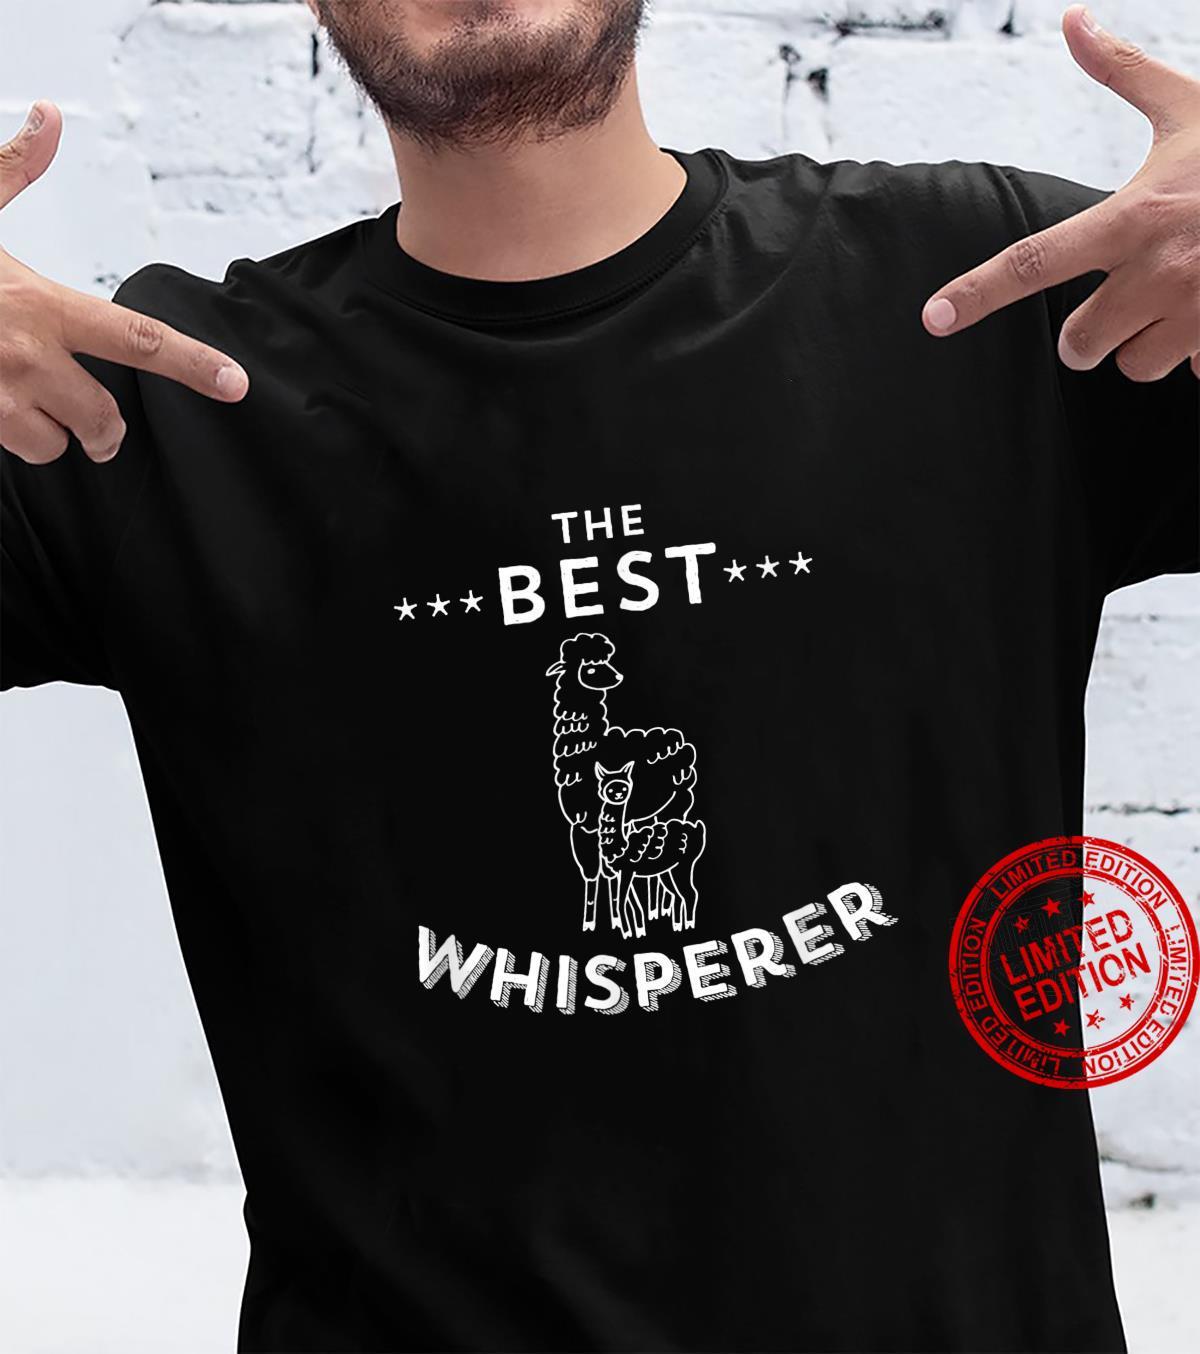 The Best Llama Whisperer Llama Quote Design Shirt